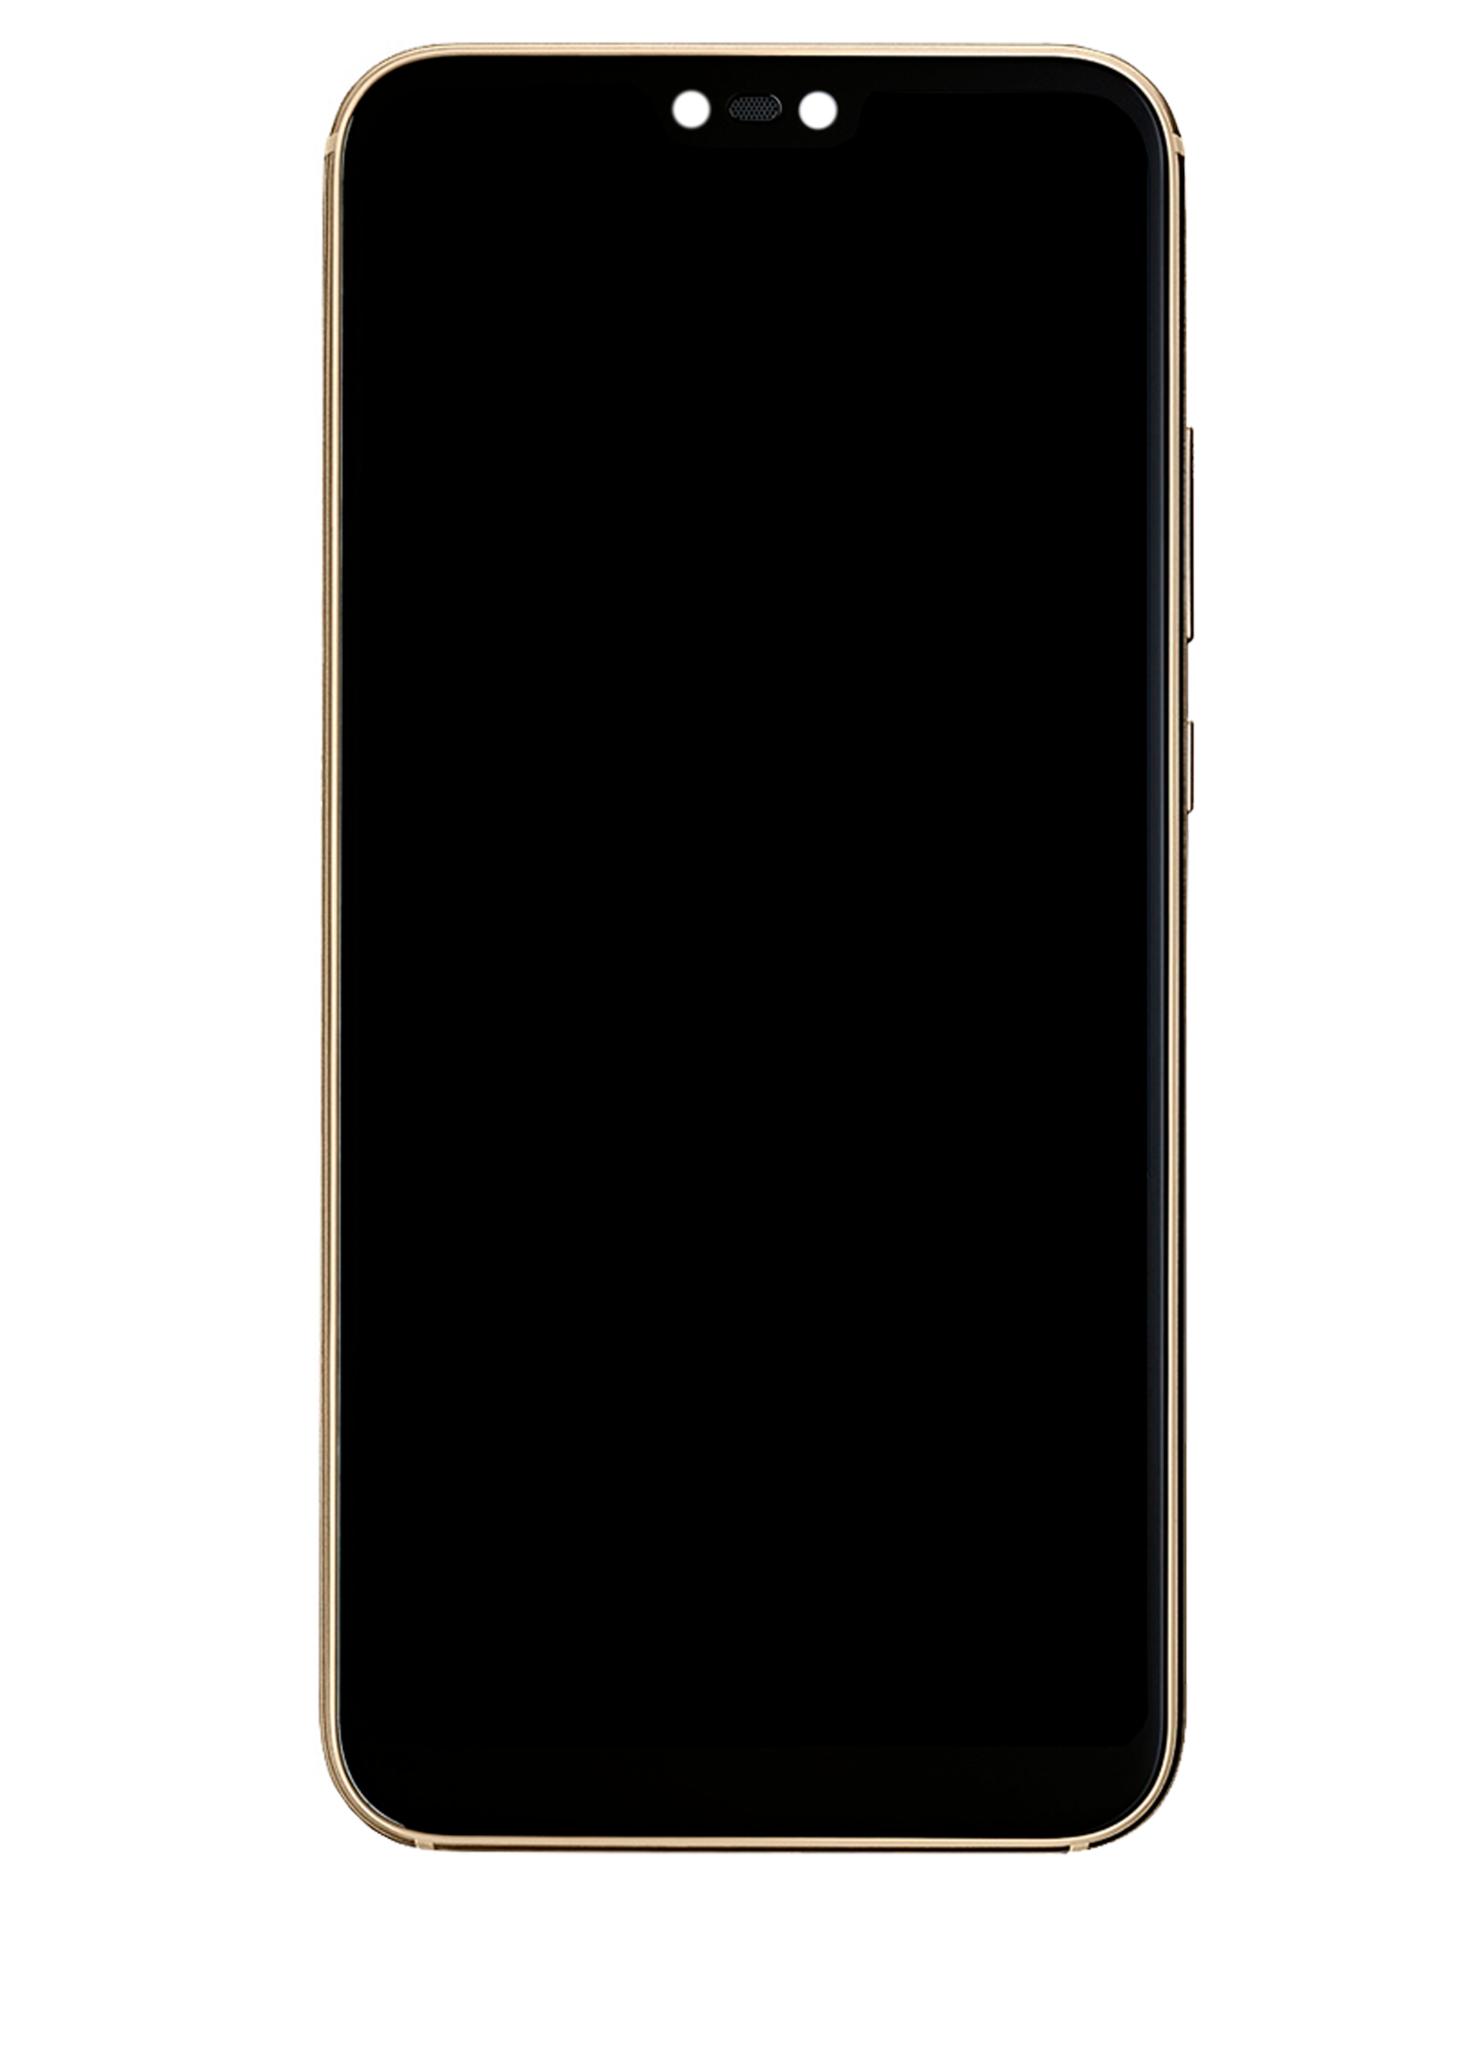 Huawei P20 Lite ANE-LX1 Display Module + Frame Gold